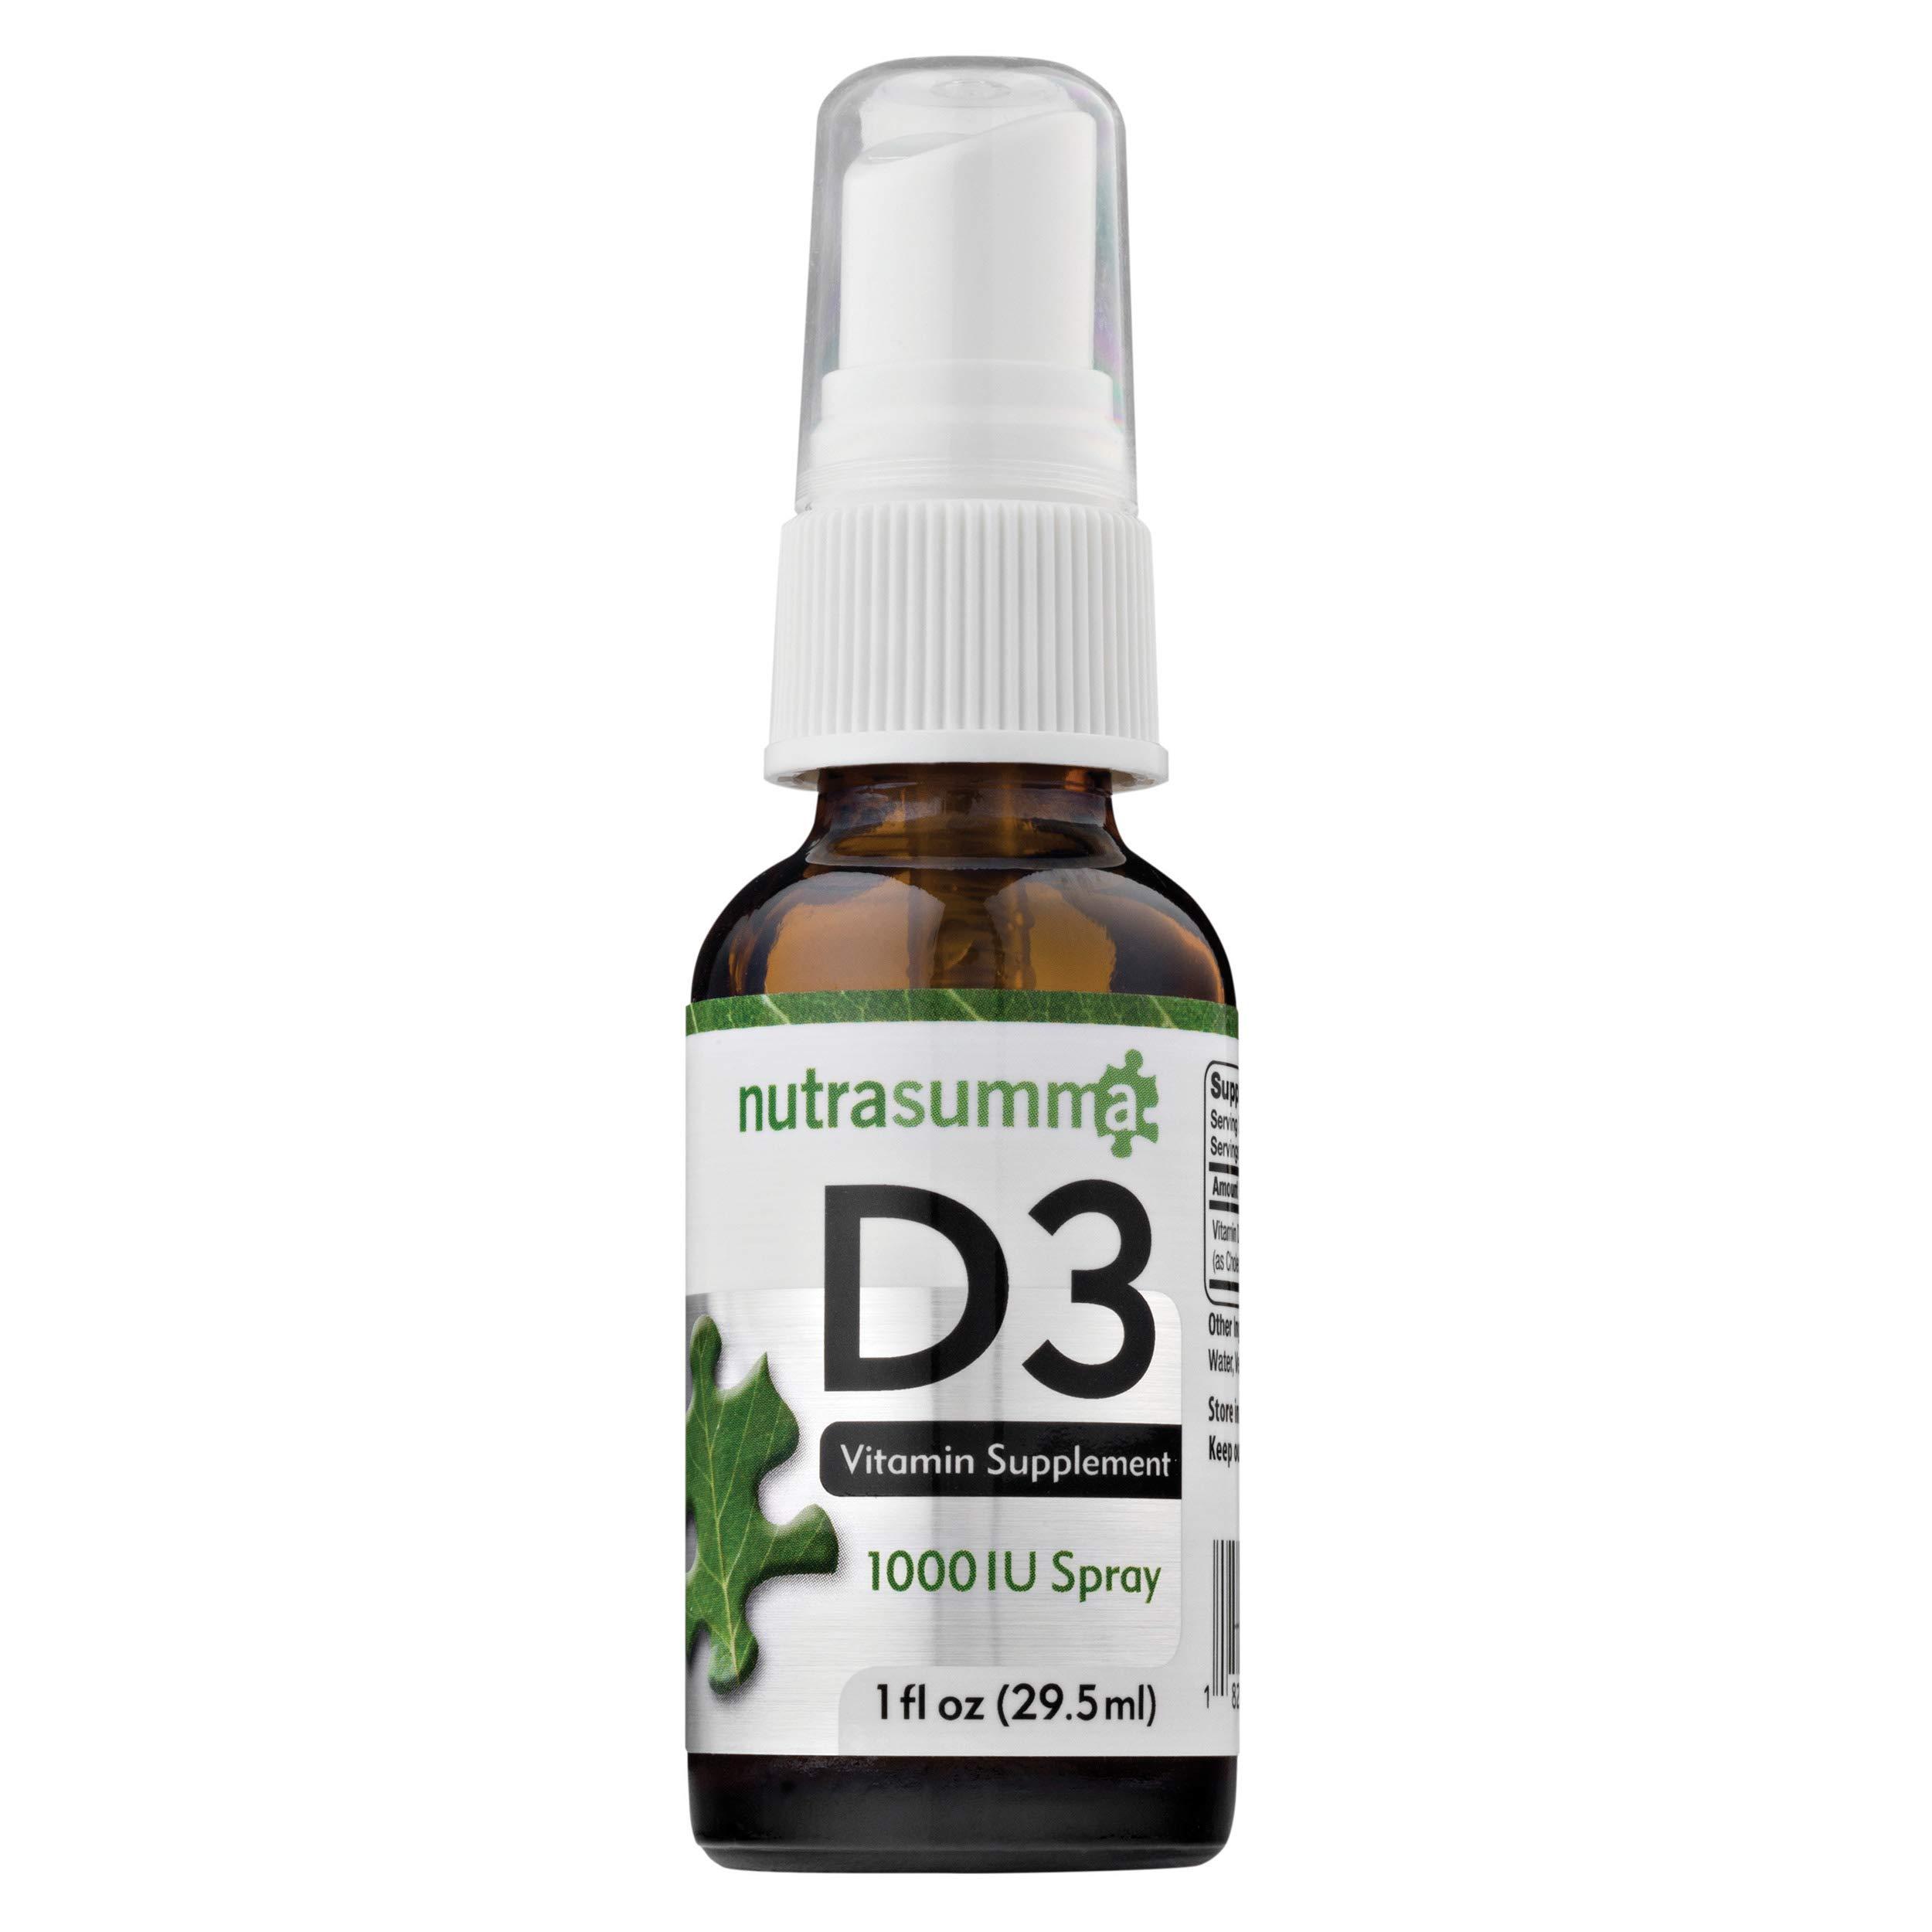 Nutrasumma Vitamin D-3 (Spray Delivery) - 1 oz